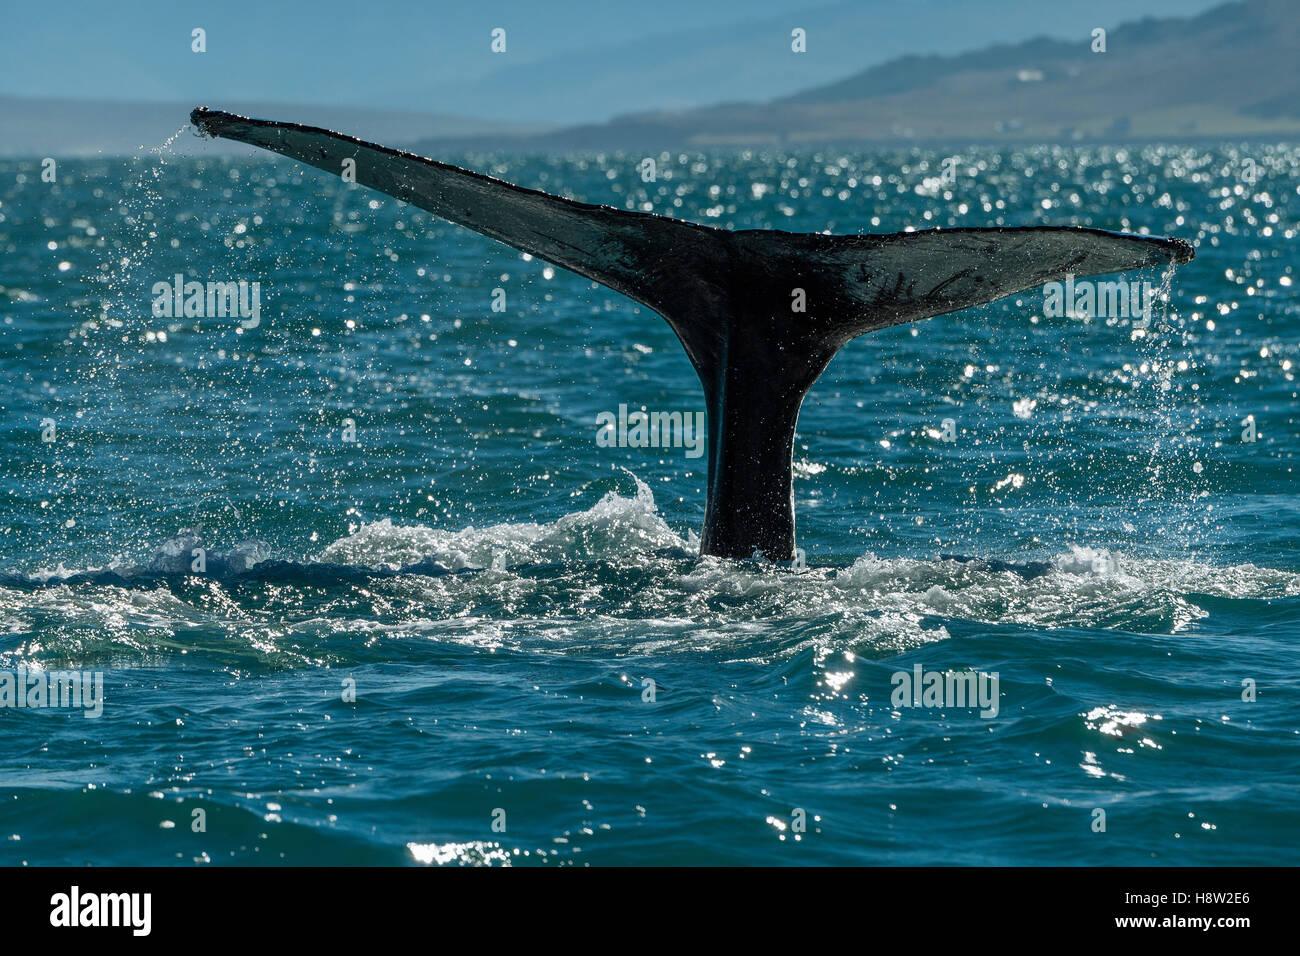 Tail, flukes, diving humpback whale (Megaptera novaeangliae), Eyjafjörður, Iceland - Stock Image